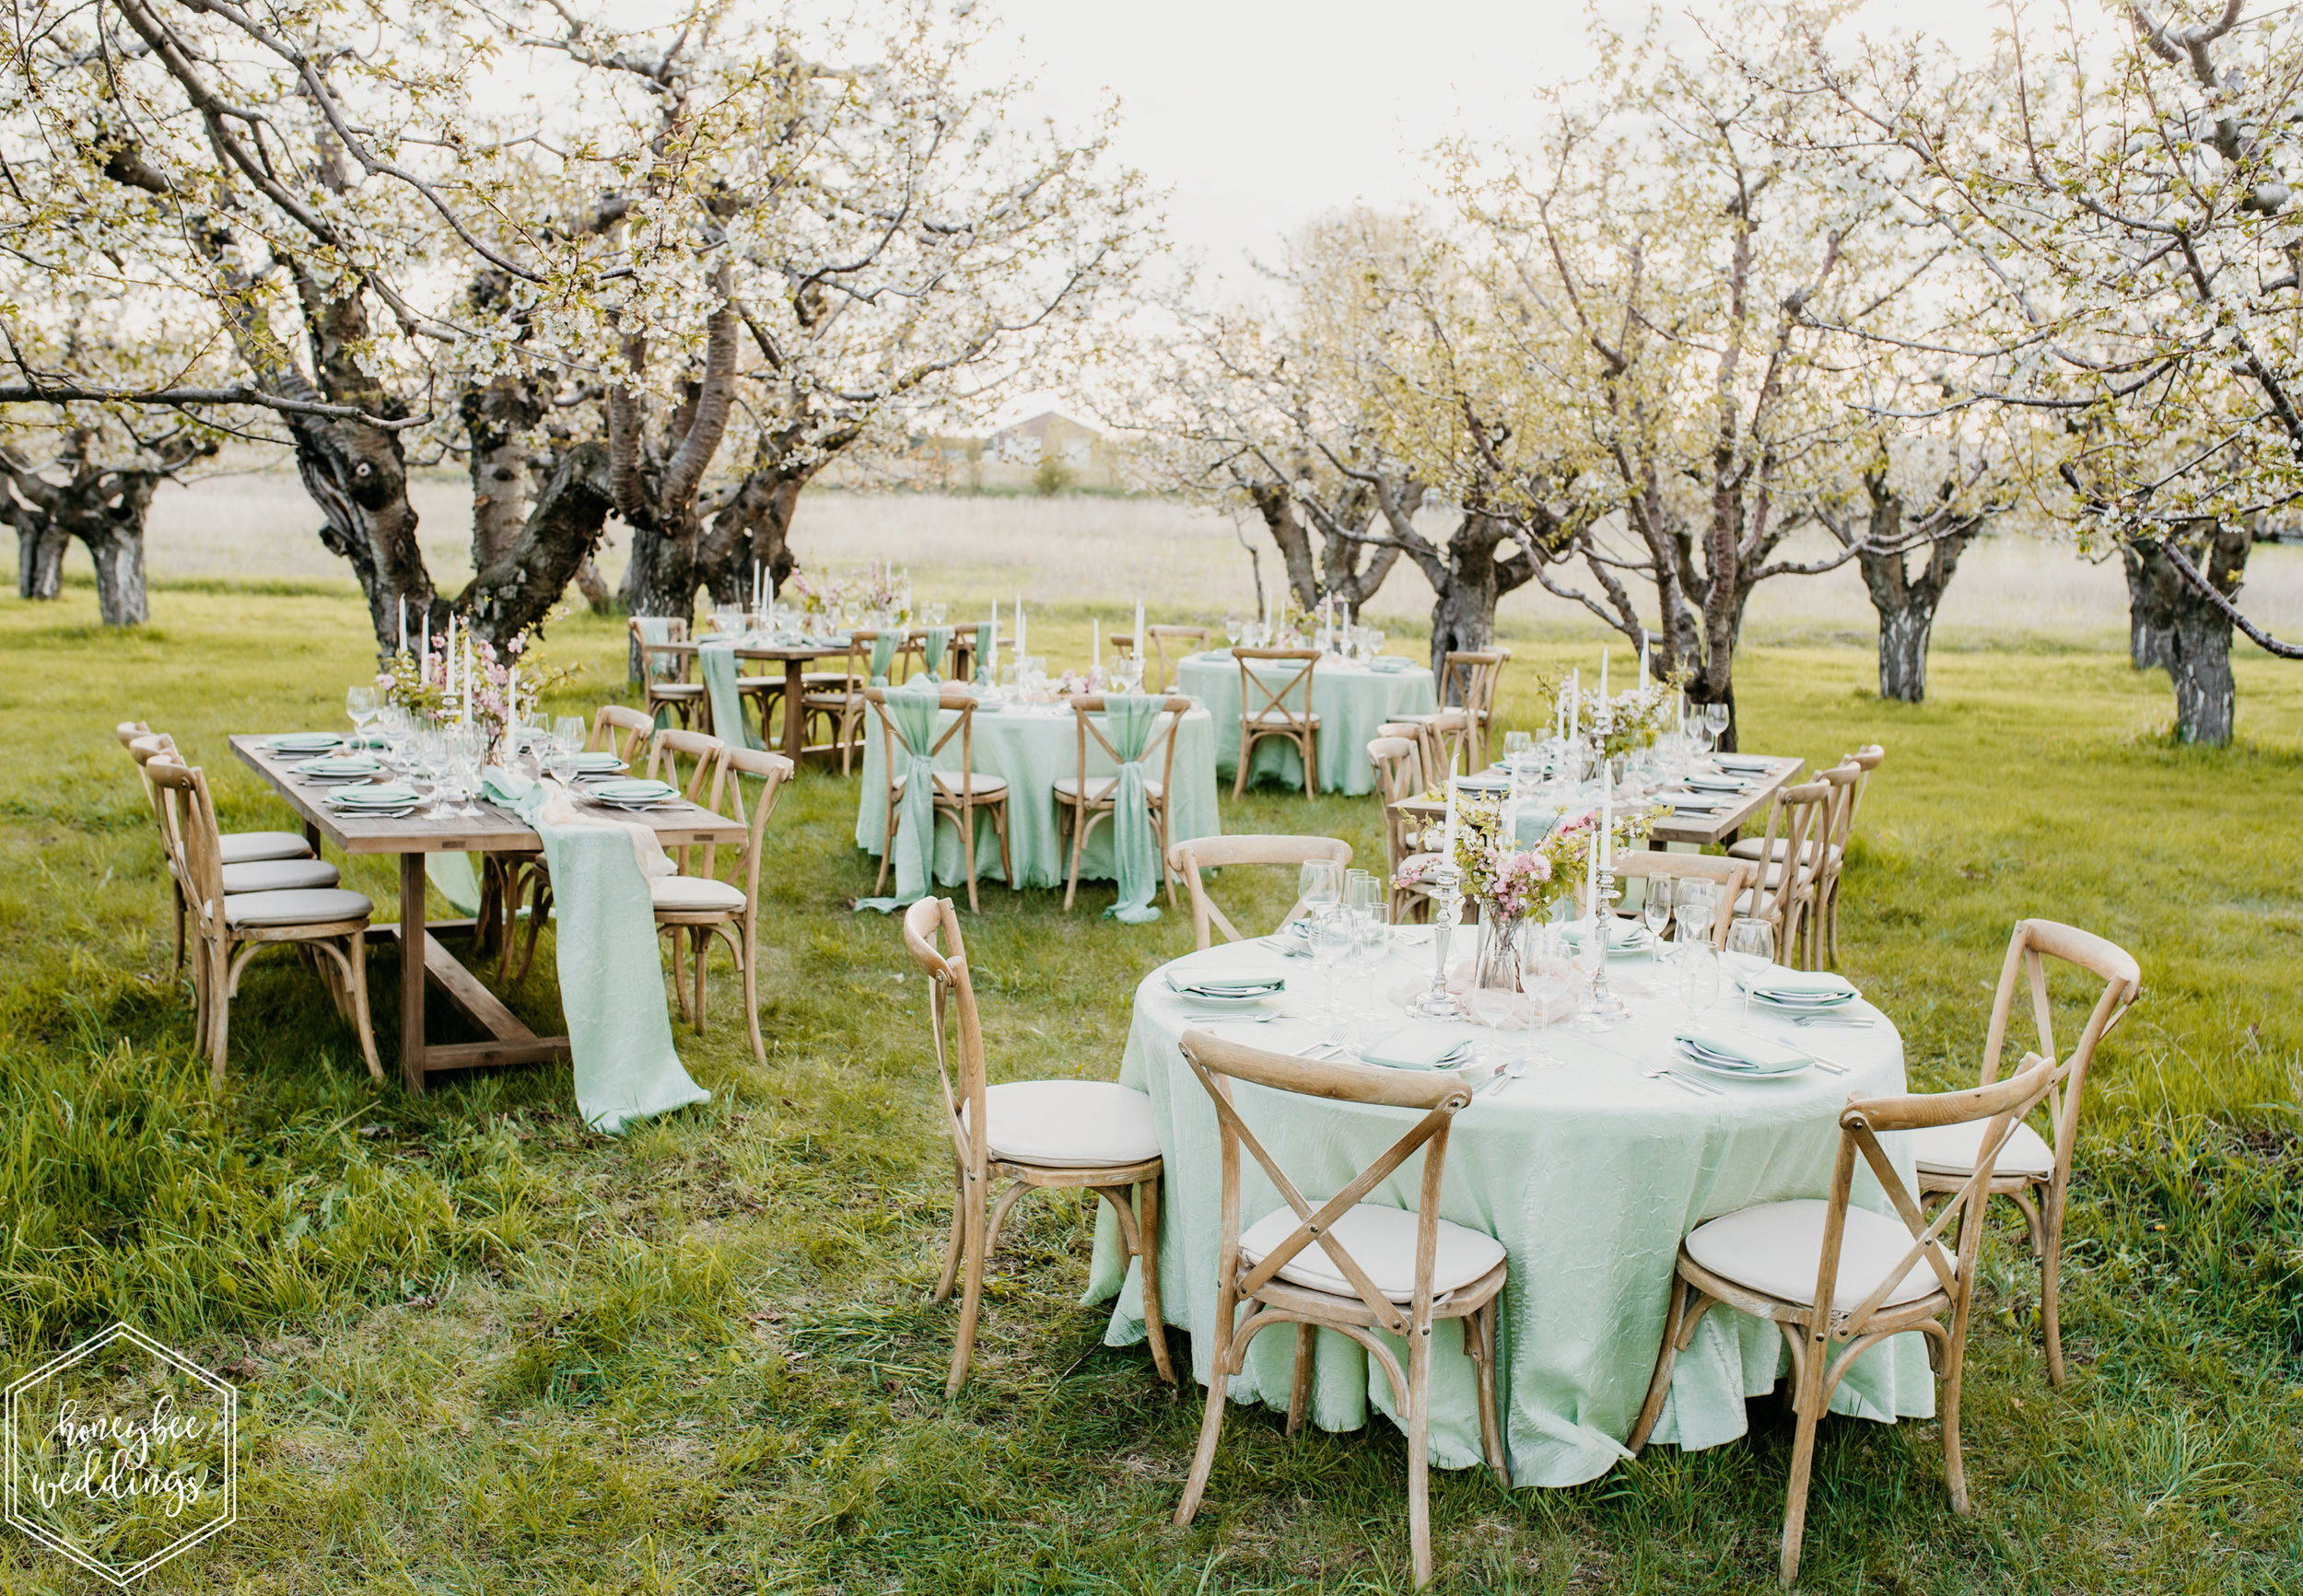 156Cherry Blossom Wedding_Styled Photoshoot_Honeybee Weddings_May 11, 2019-202.jpg